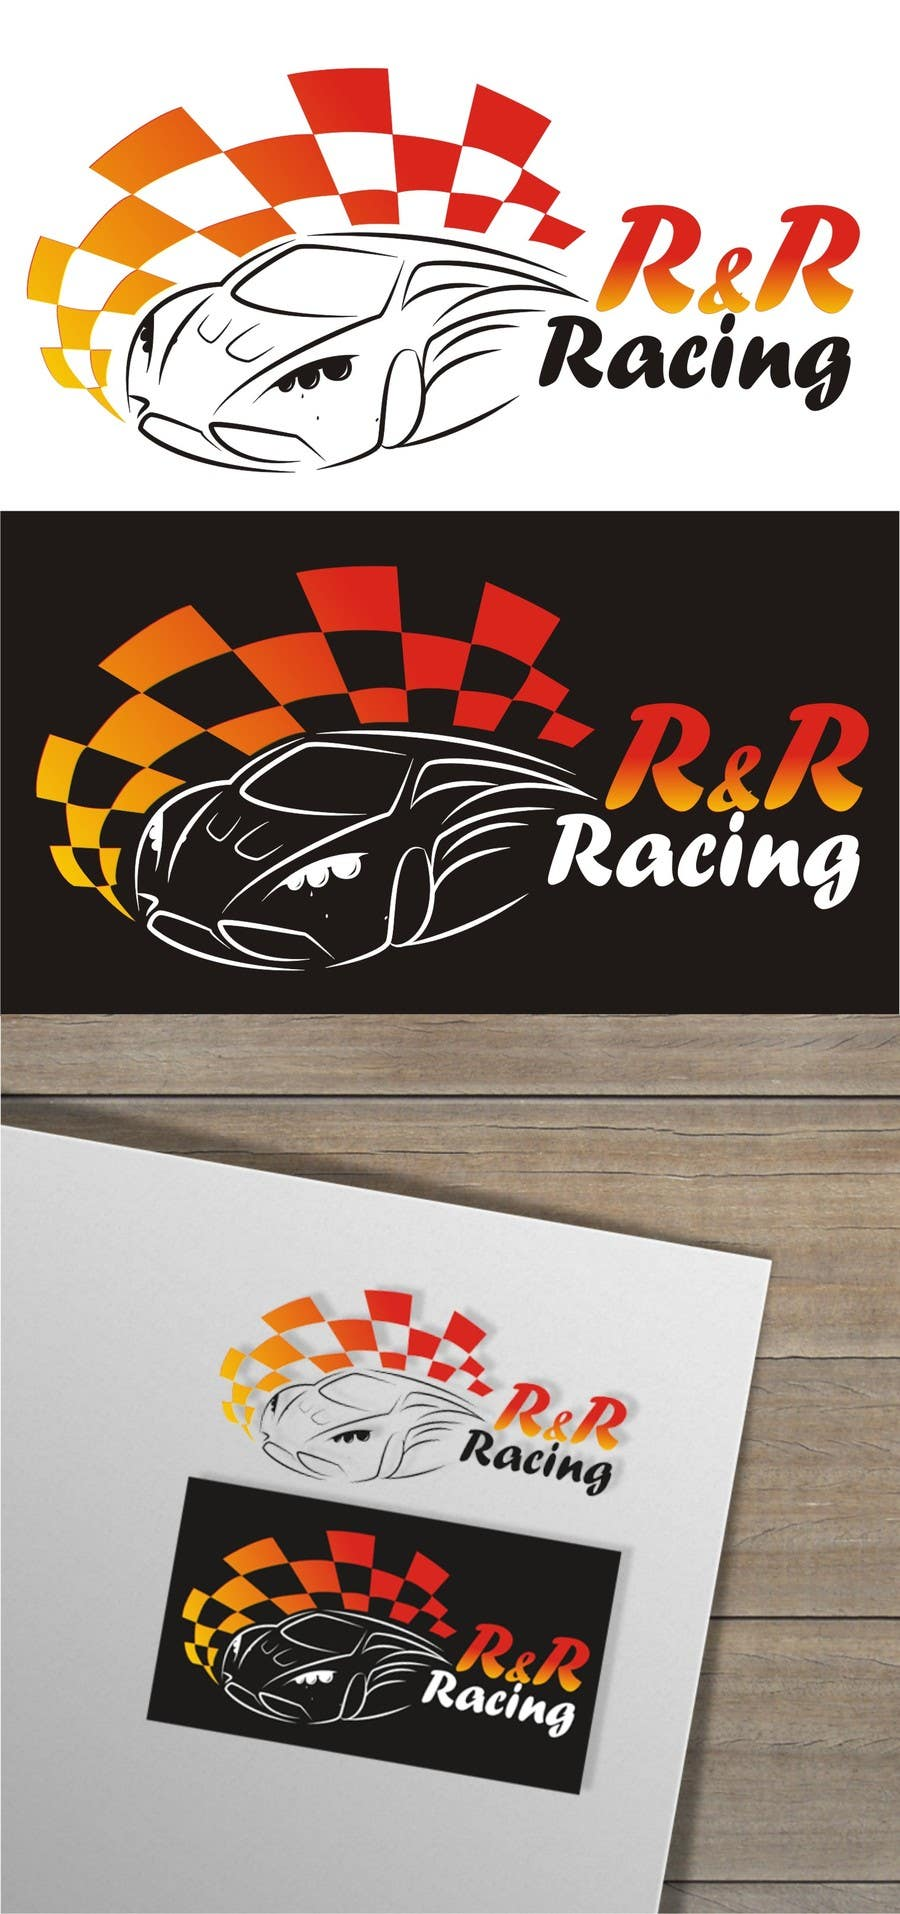 Konkurrenceindlæg #                                        8                                      for                                         Design a Logo for R & R Racing